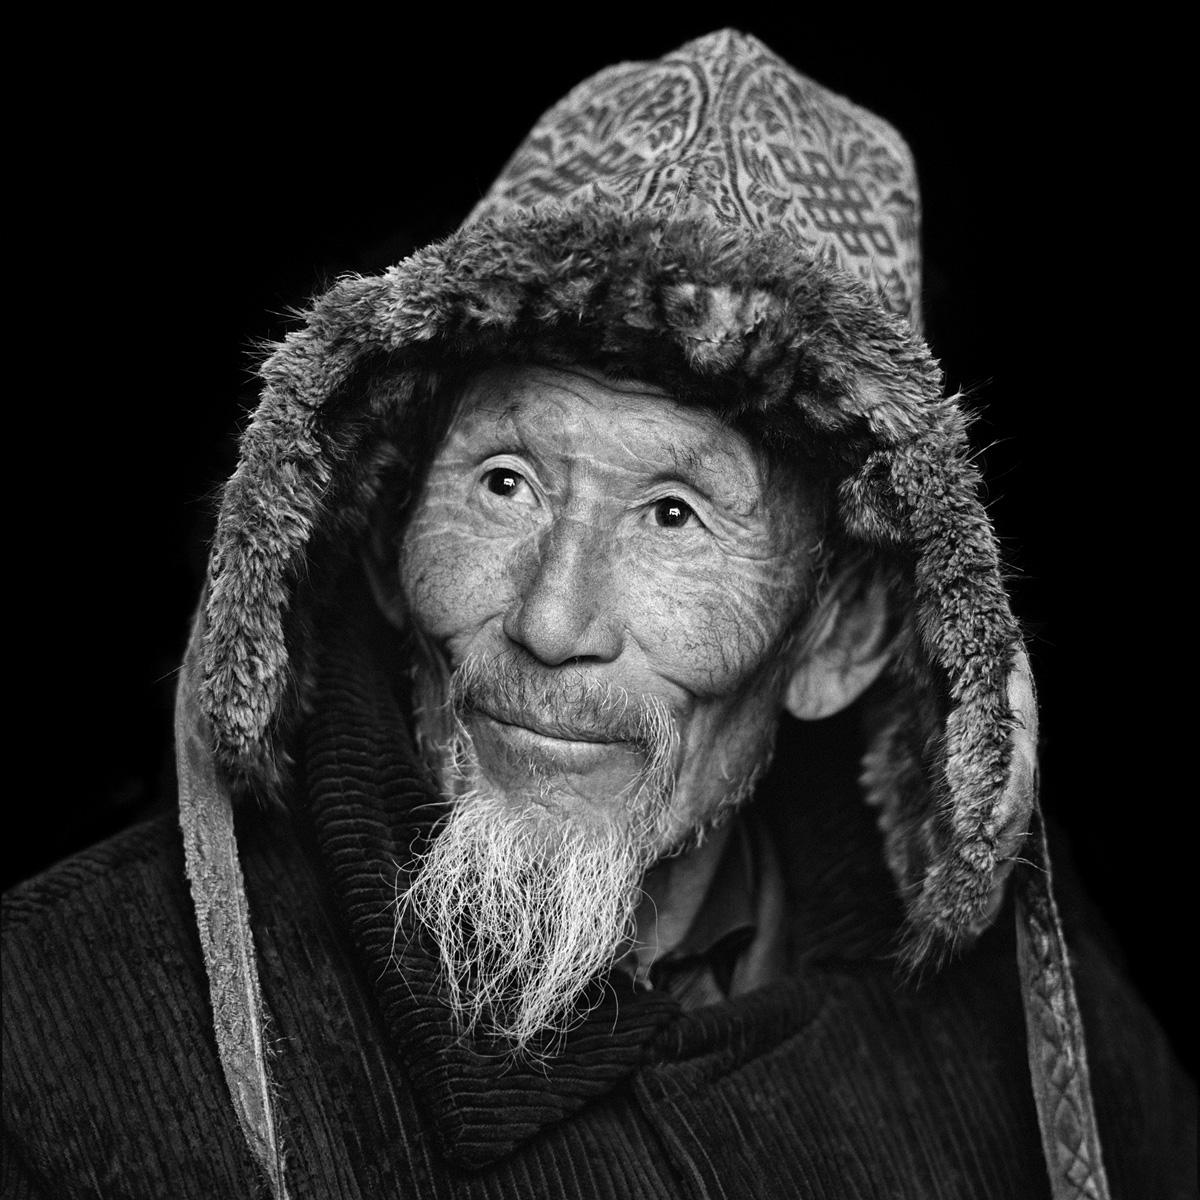 © Christine Turnauer – Ablaikhan, Mongolia, 2013, Coal pigment print, ed. of 12